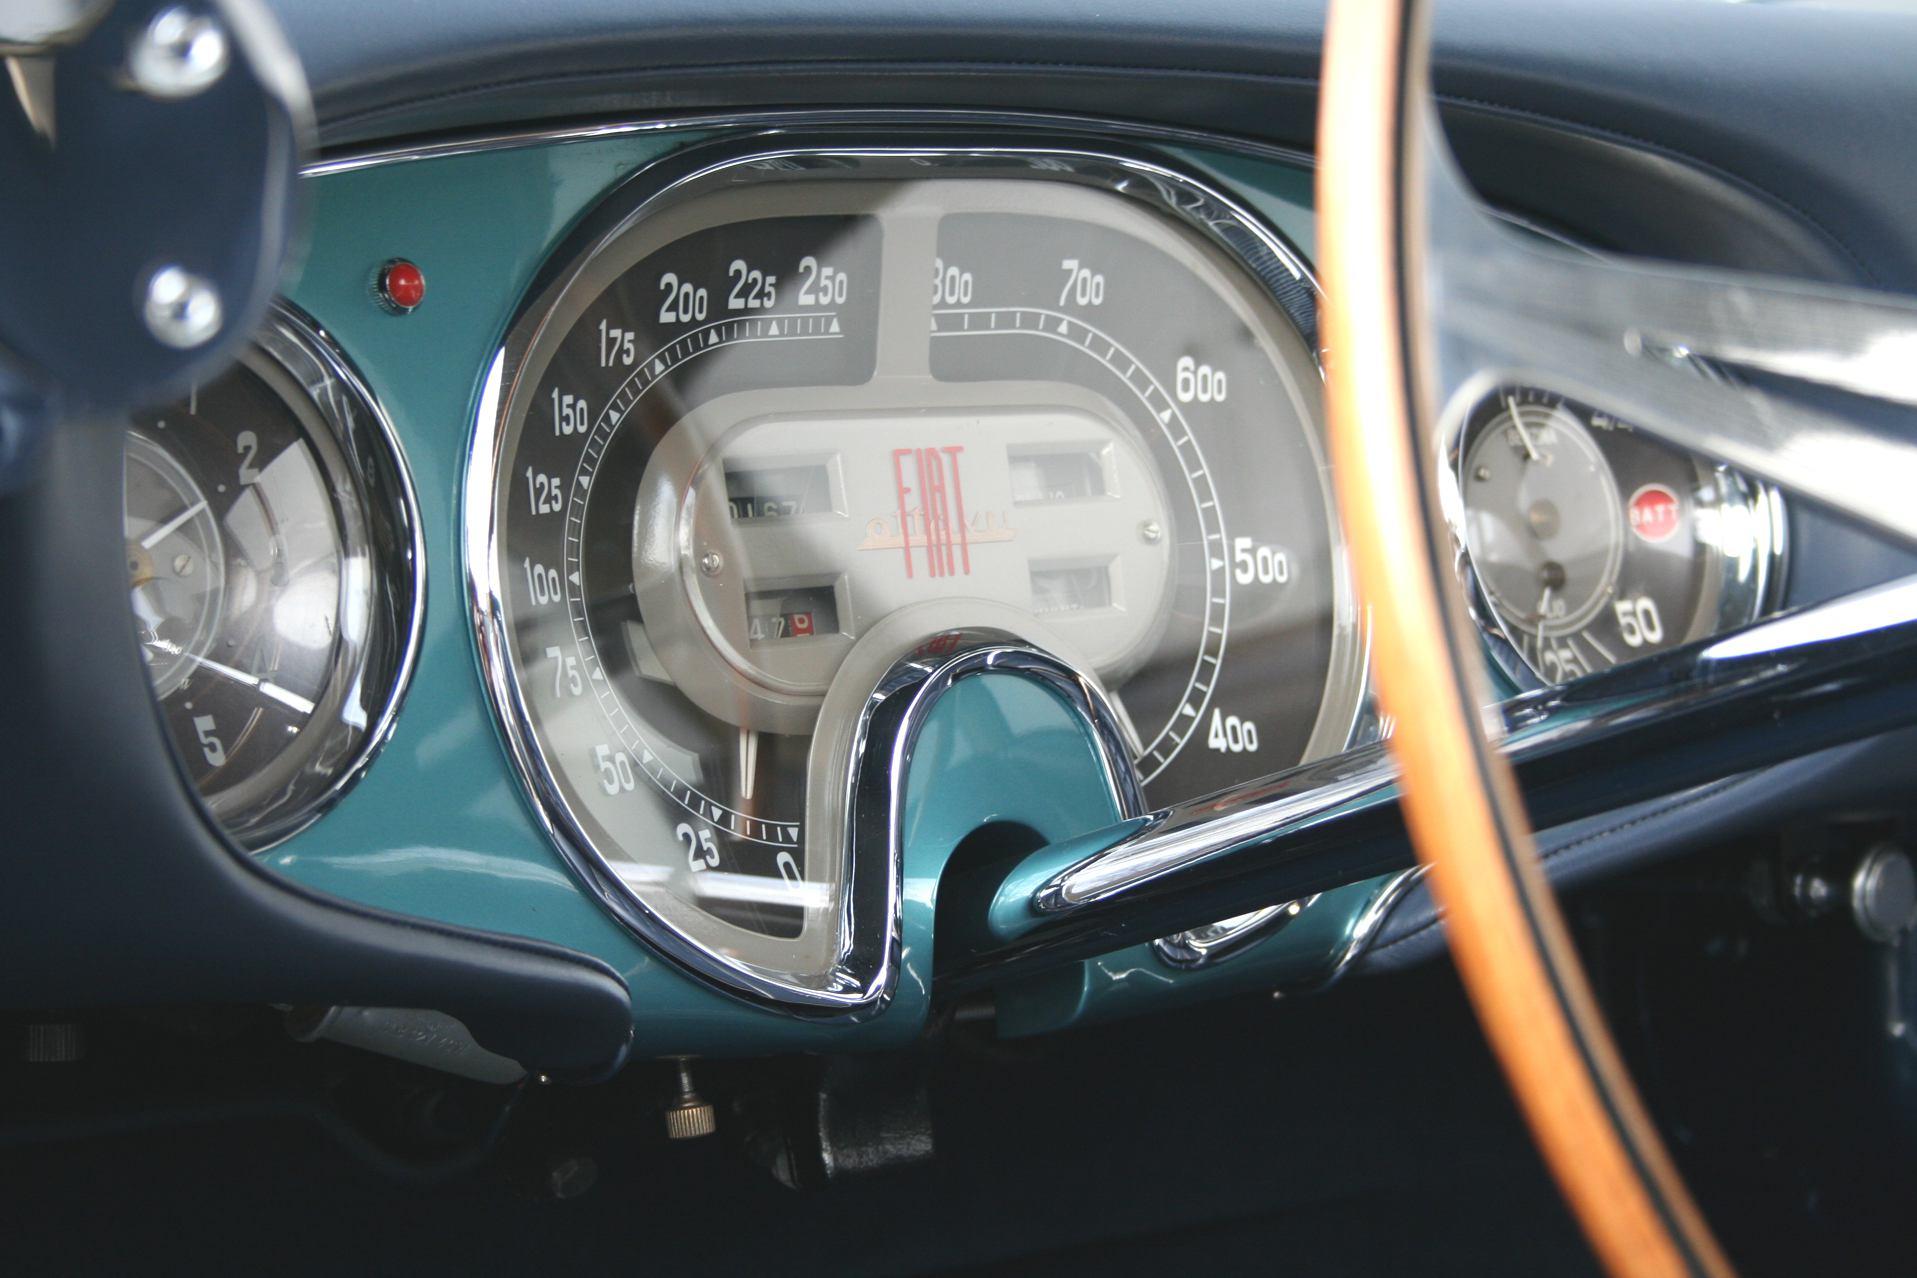 1953-Vignale-Fiat-8V-Interior-01